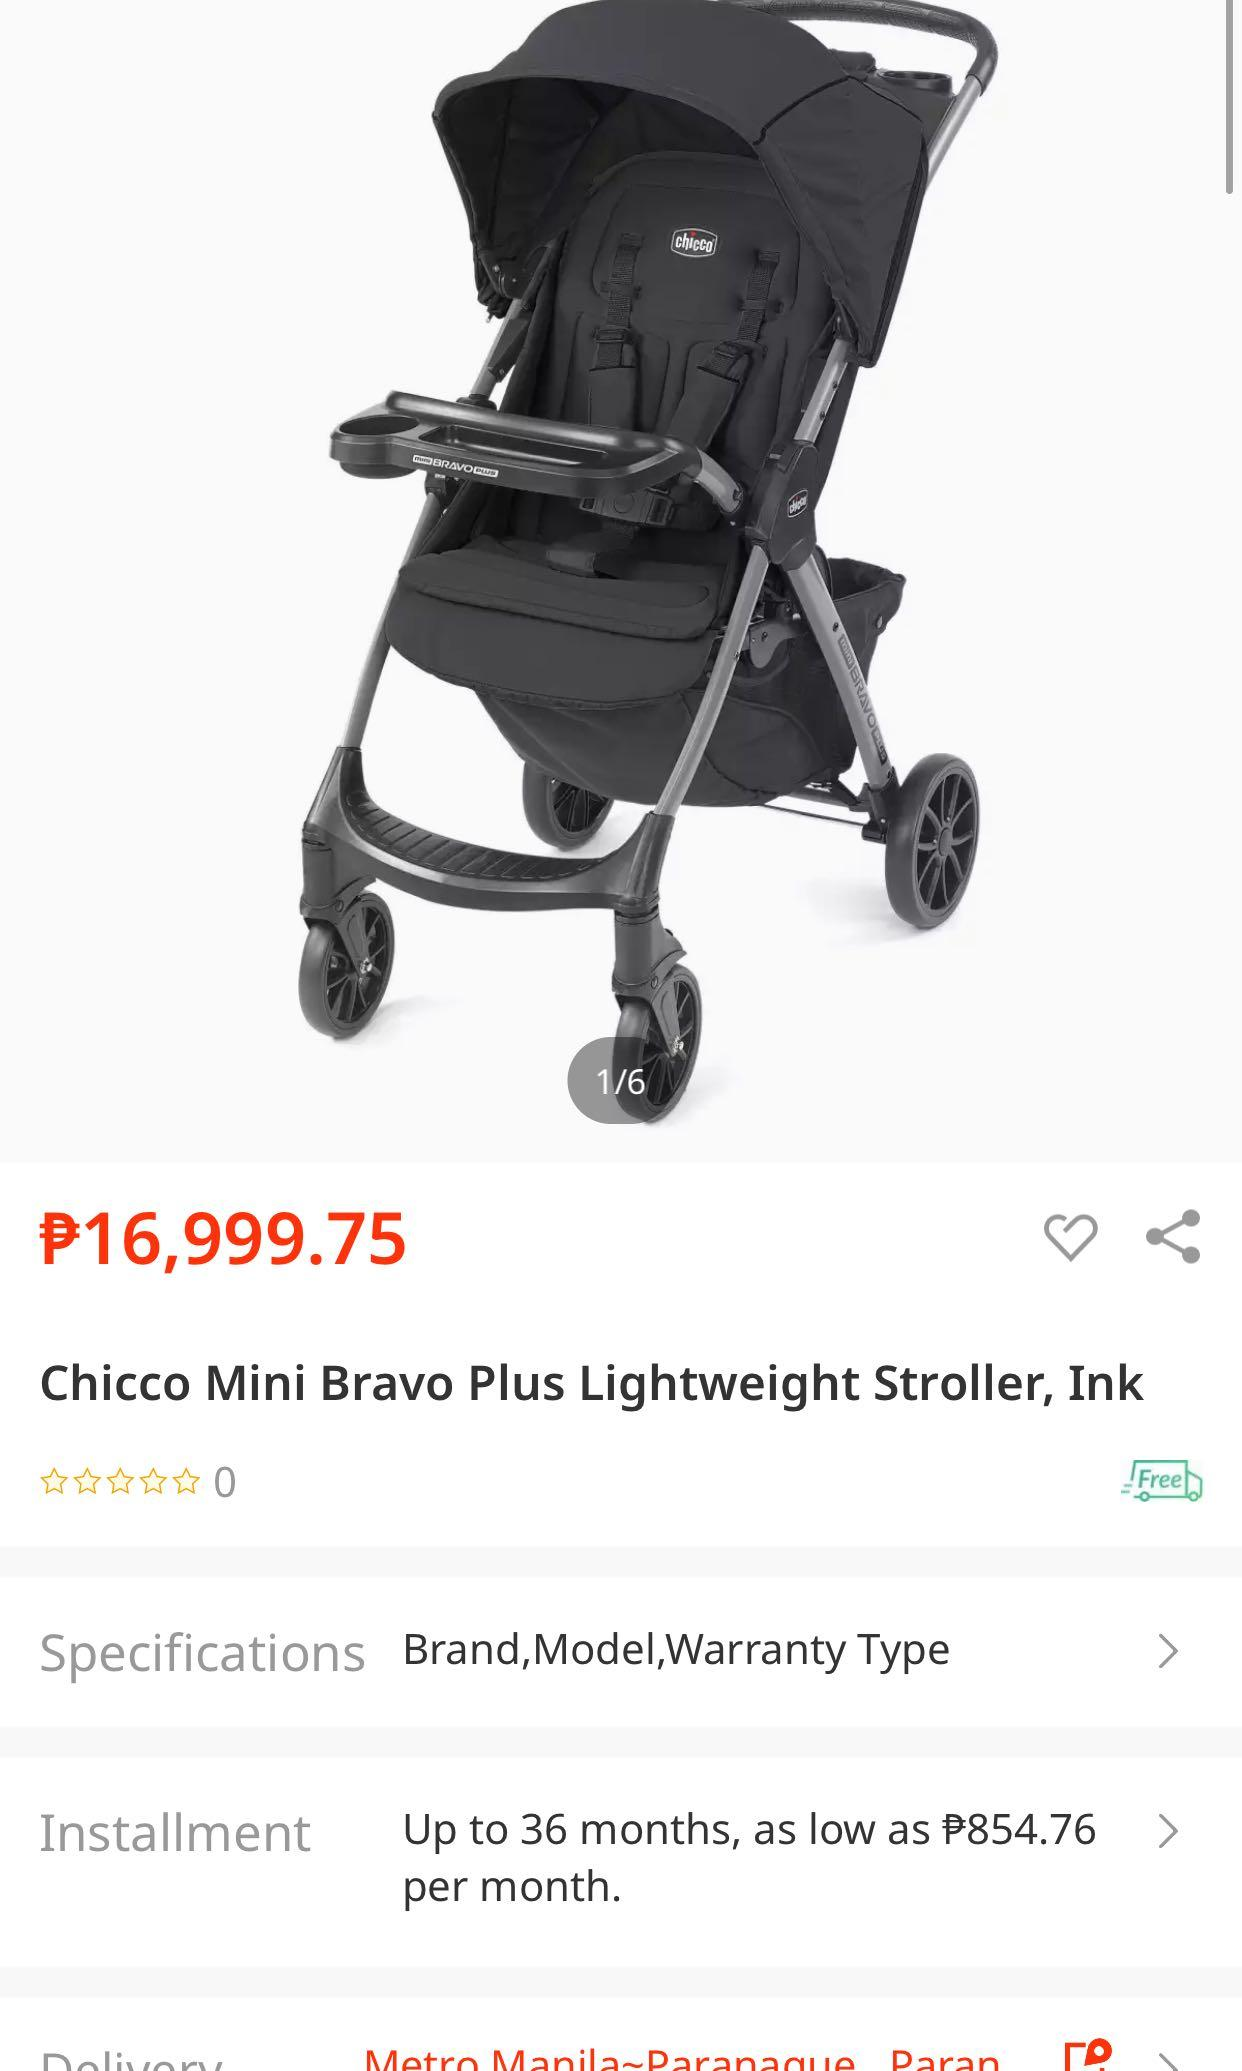 Chicco Mini Bravo Plus On Carousell